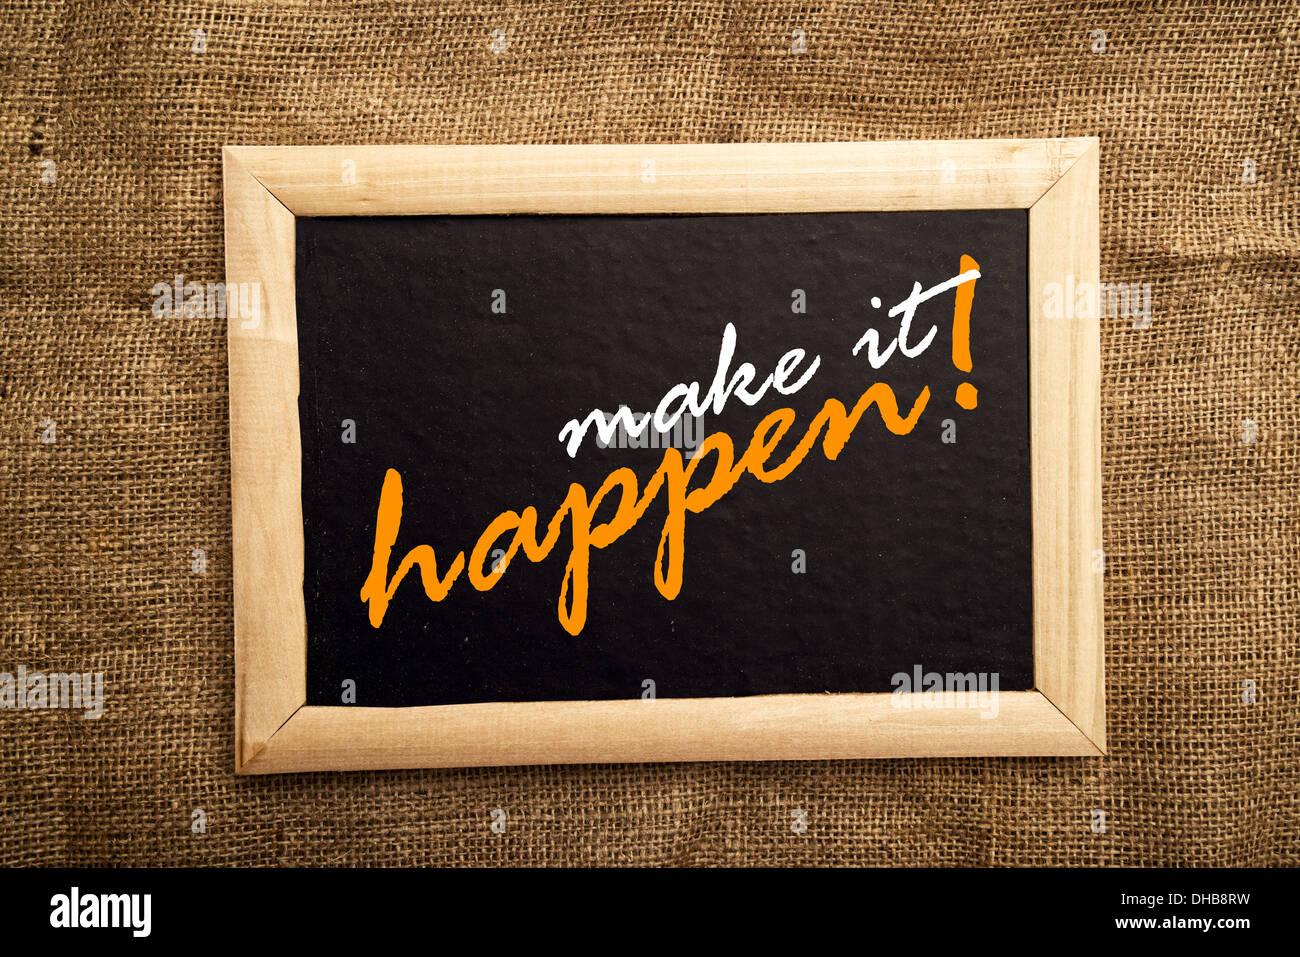 make it happen, motivational message on blackboard. - Stock Image